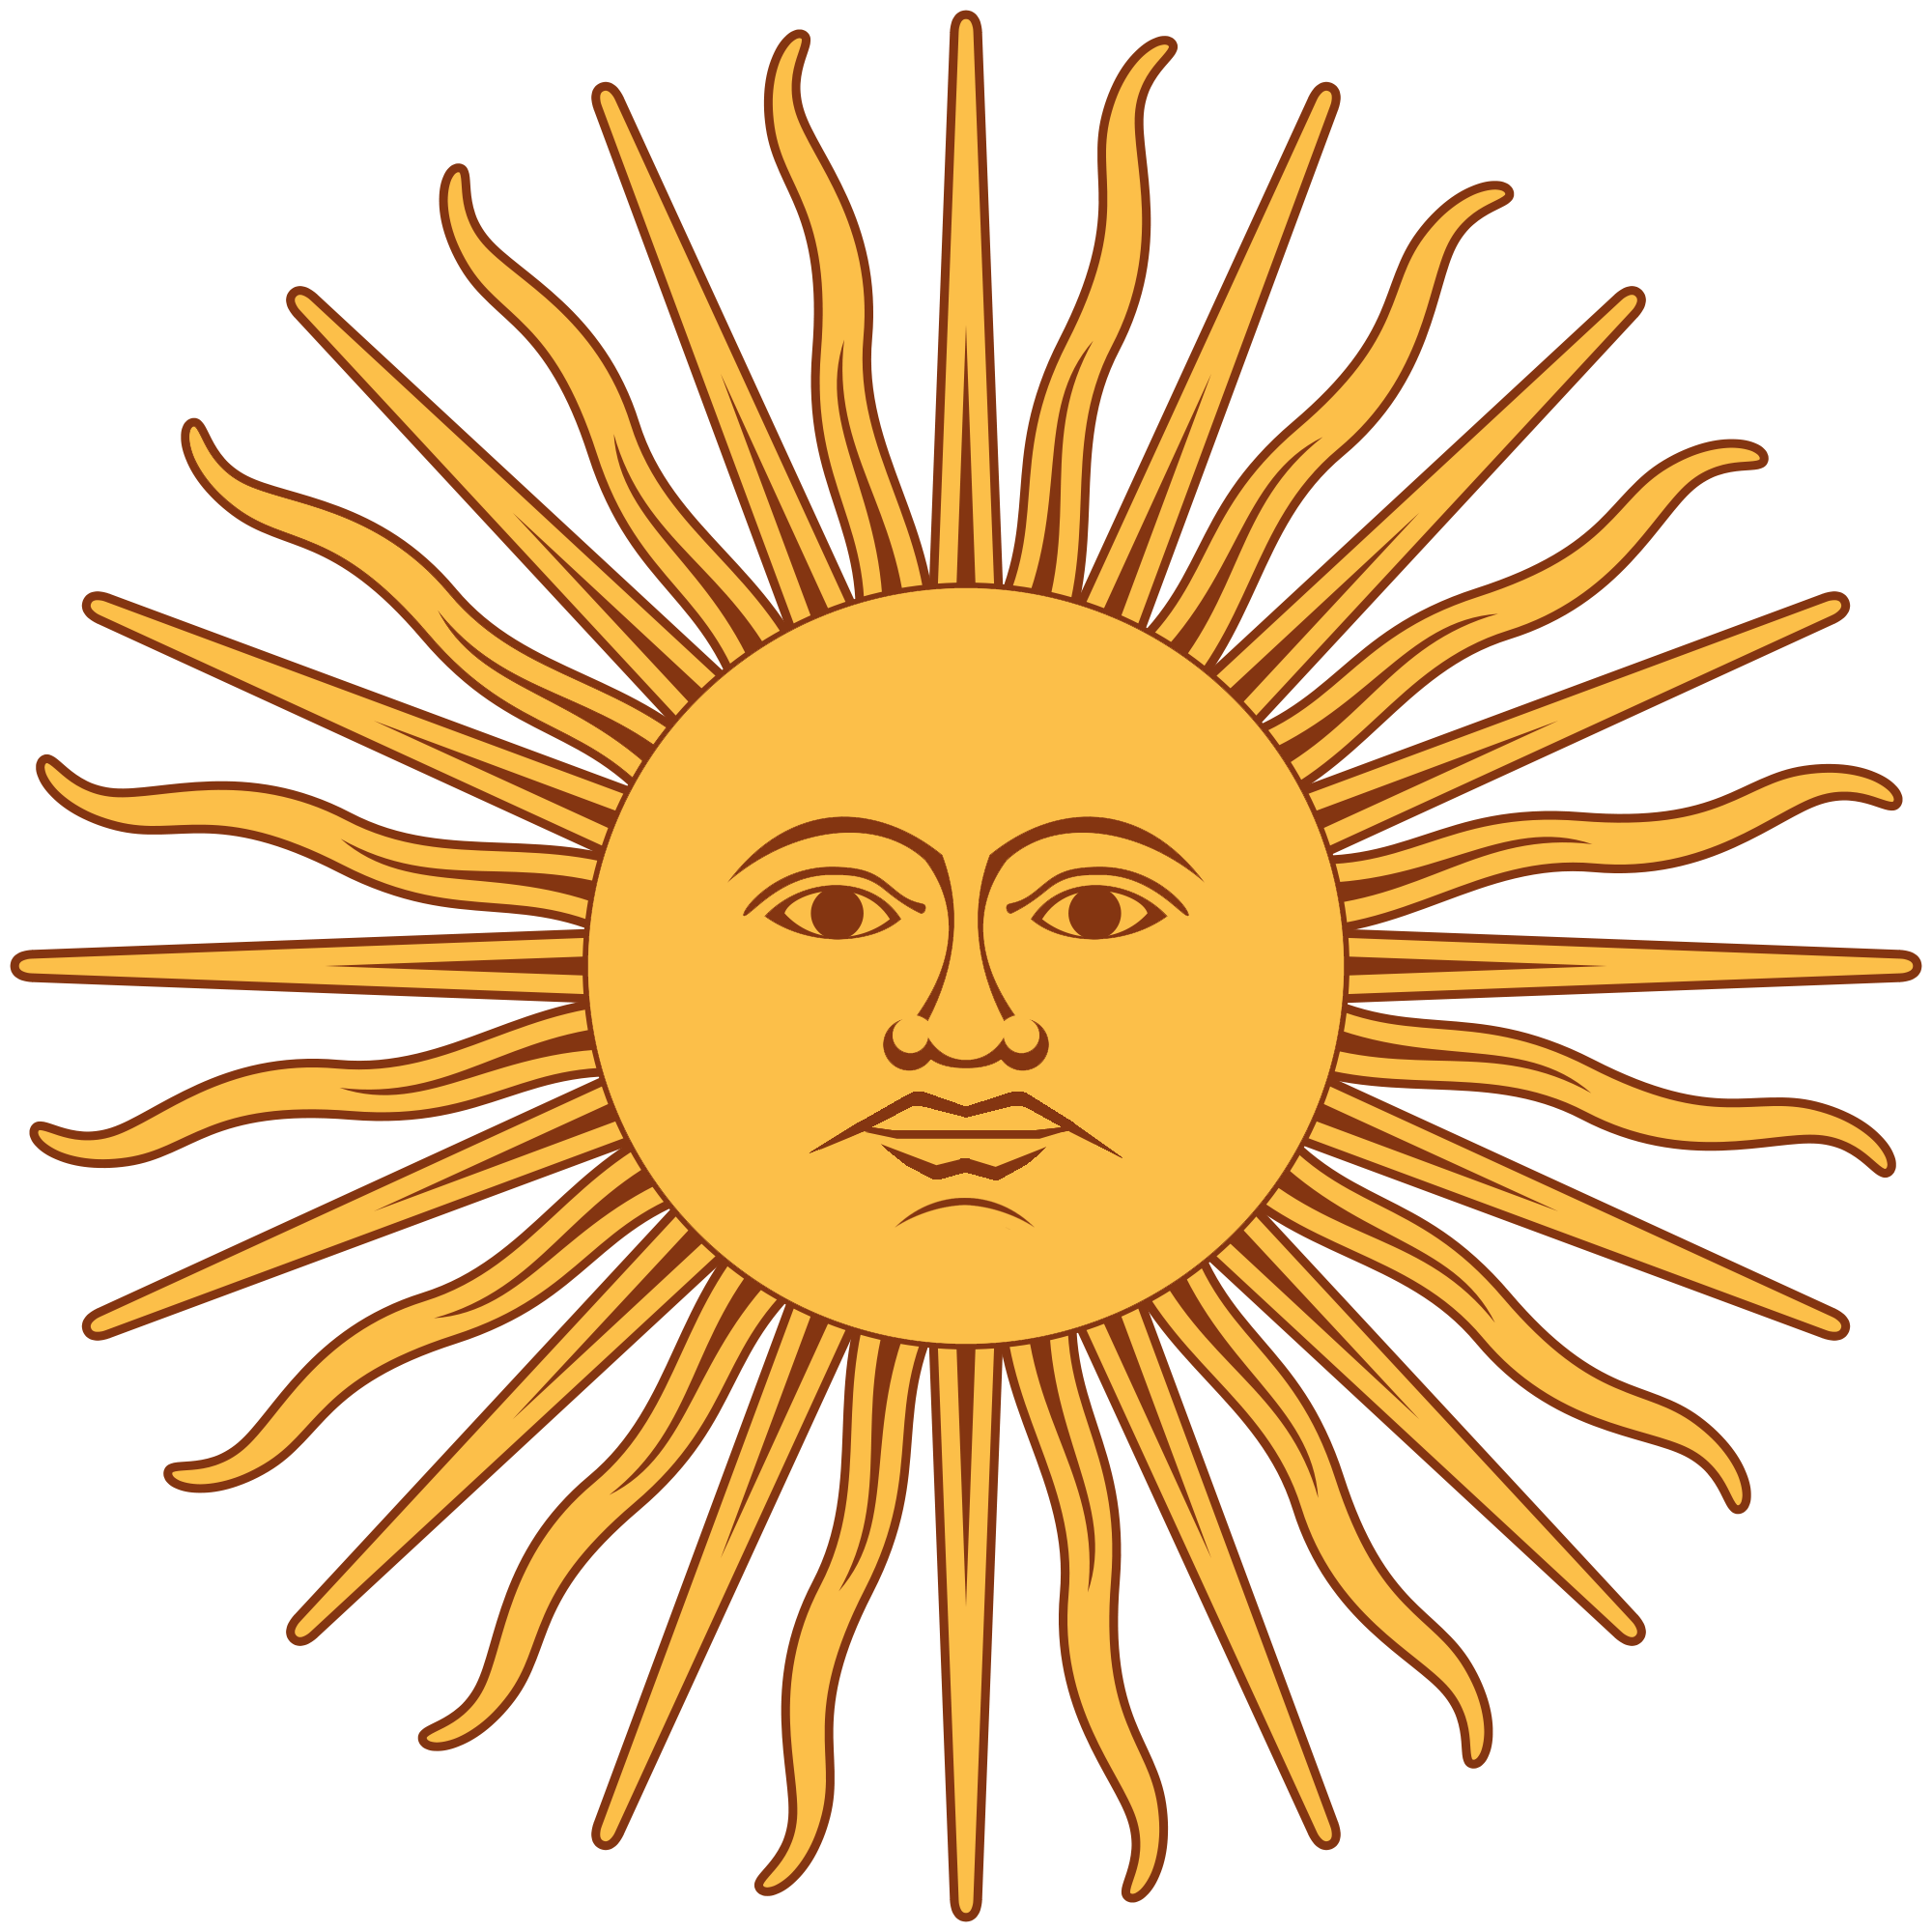 File:Sol de Mayo Bandera Argentina.png.